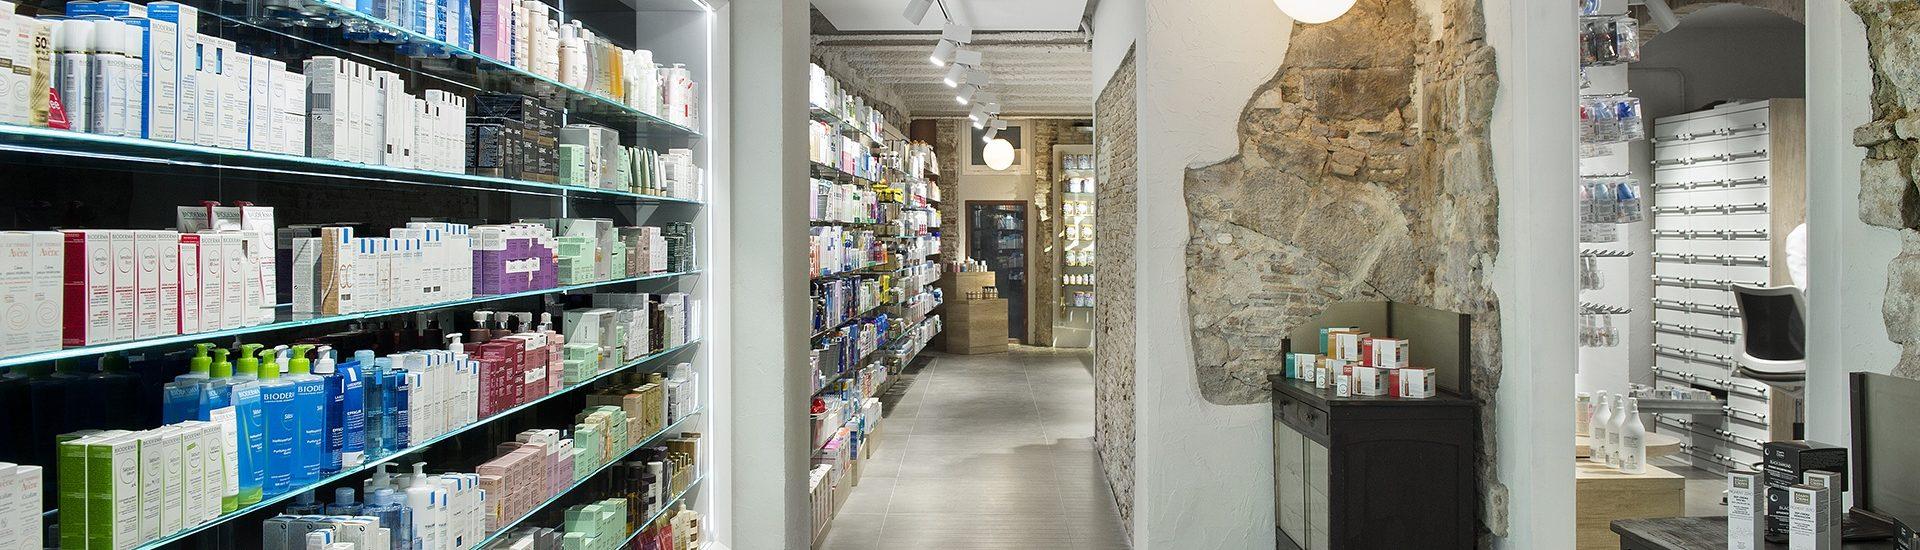 Detalles interiores de la Farmacia Alomar